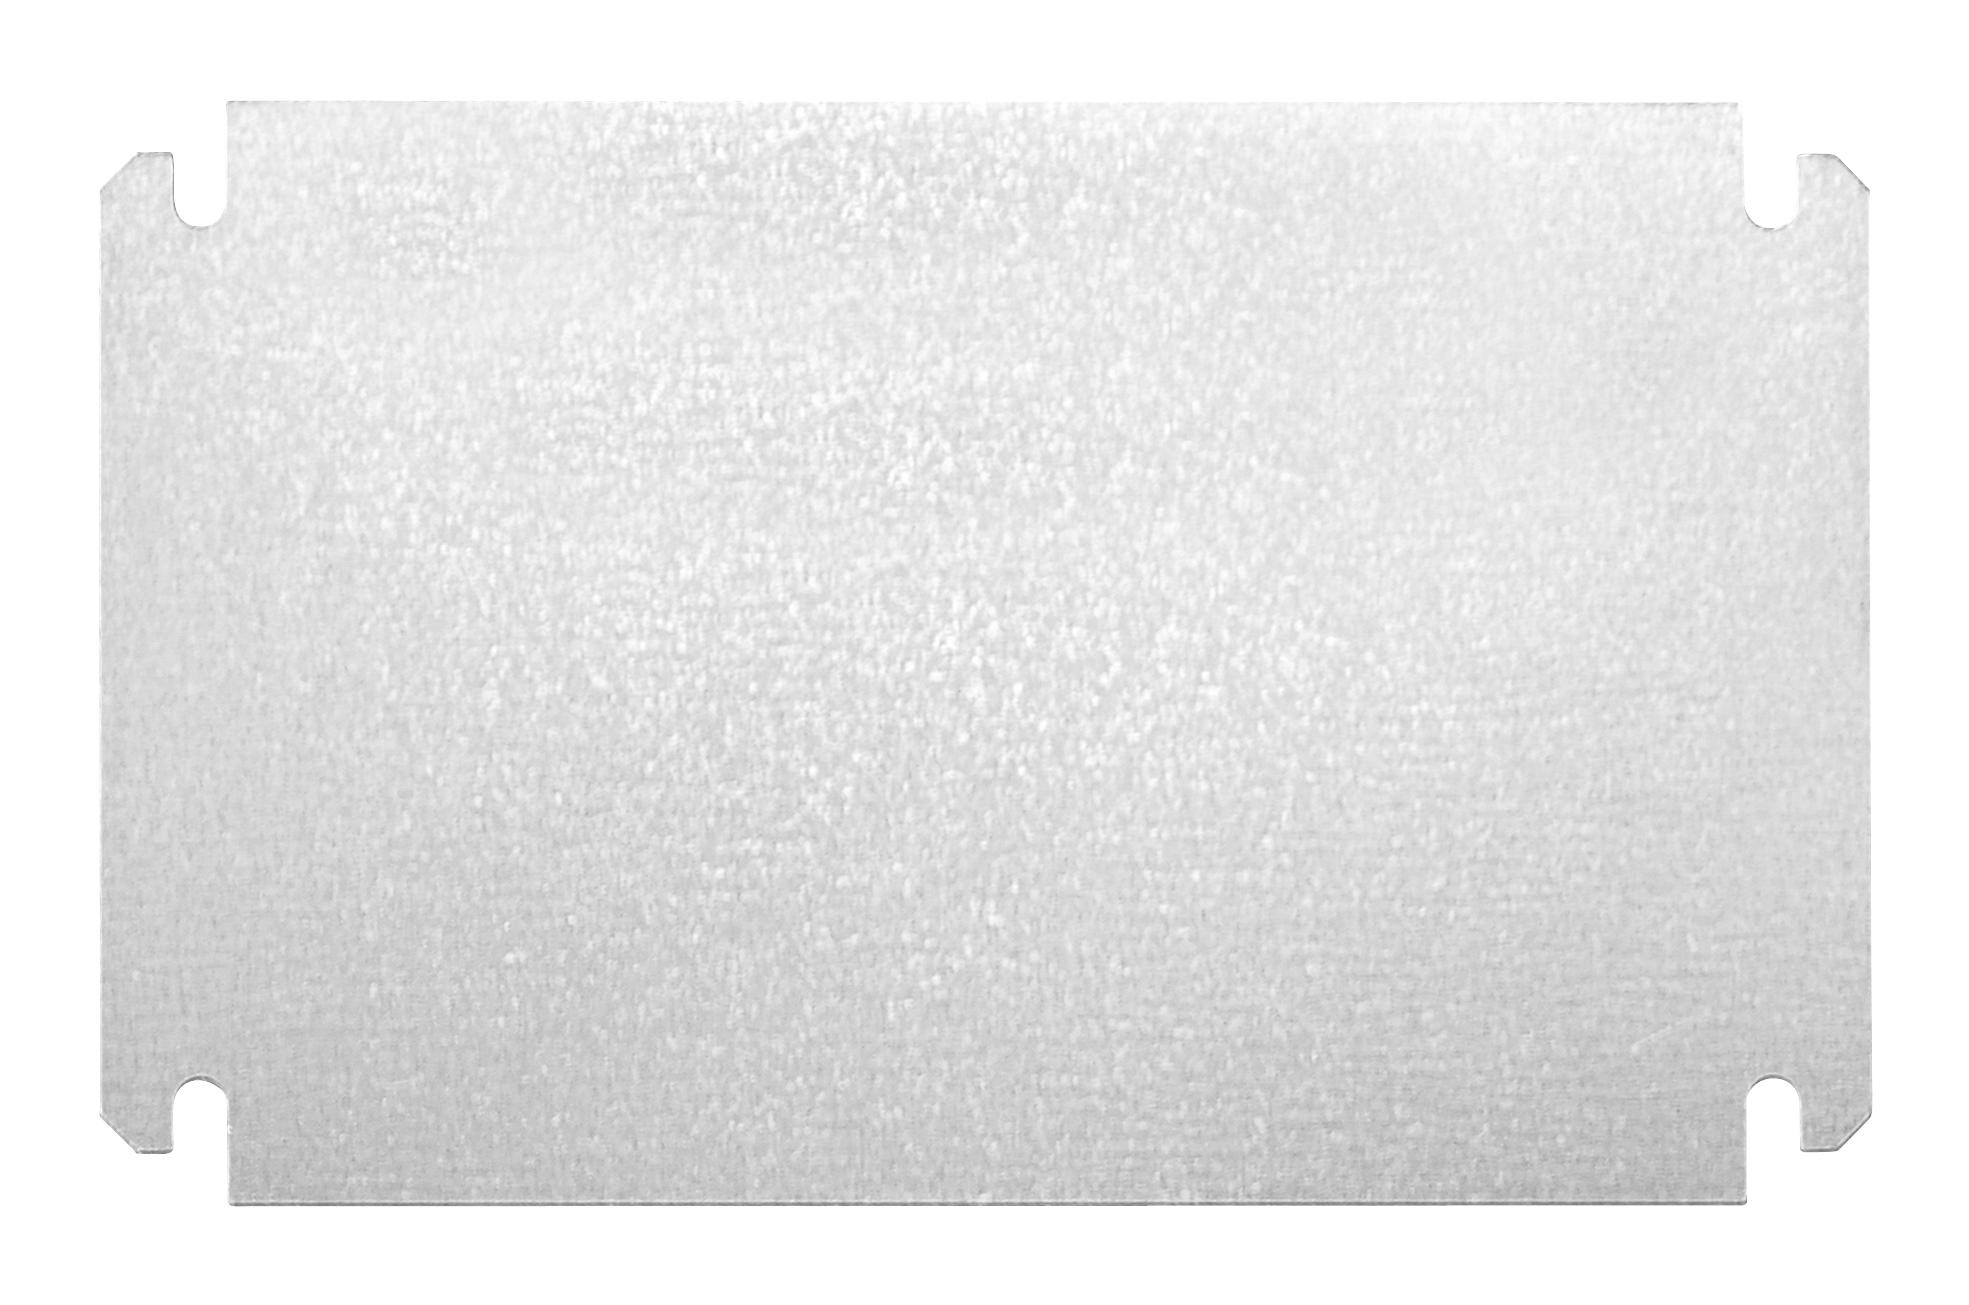 1 Stk Montageplatte PB - 238x148mm IG710102--